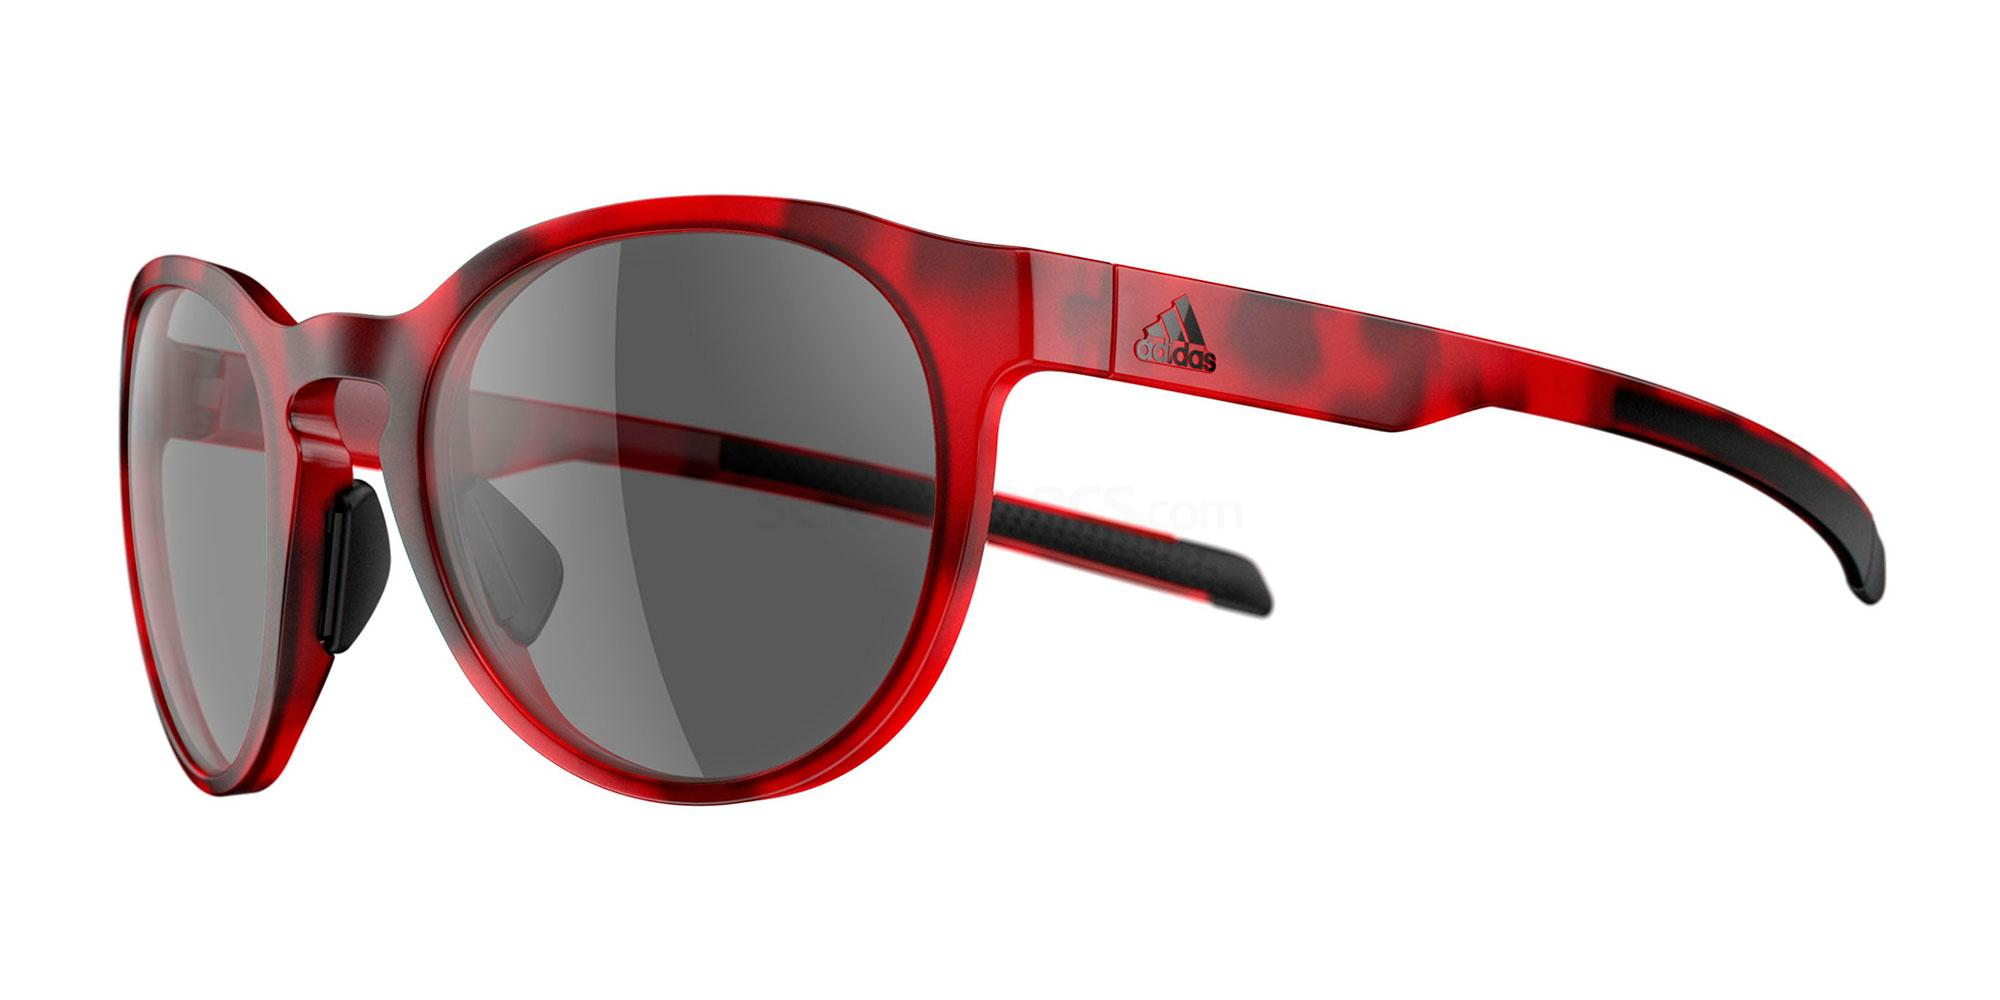 ad35 75 3000 ad35 Proshift Sunglasses, Adidas